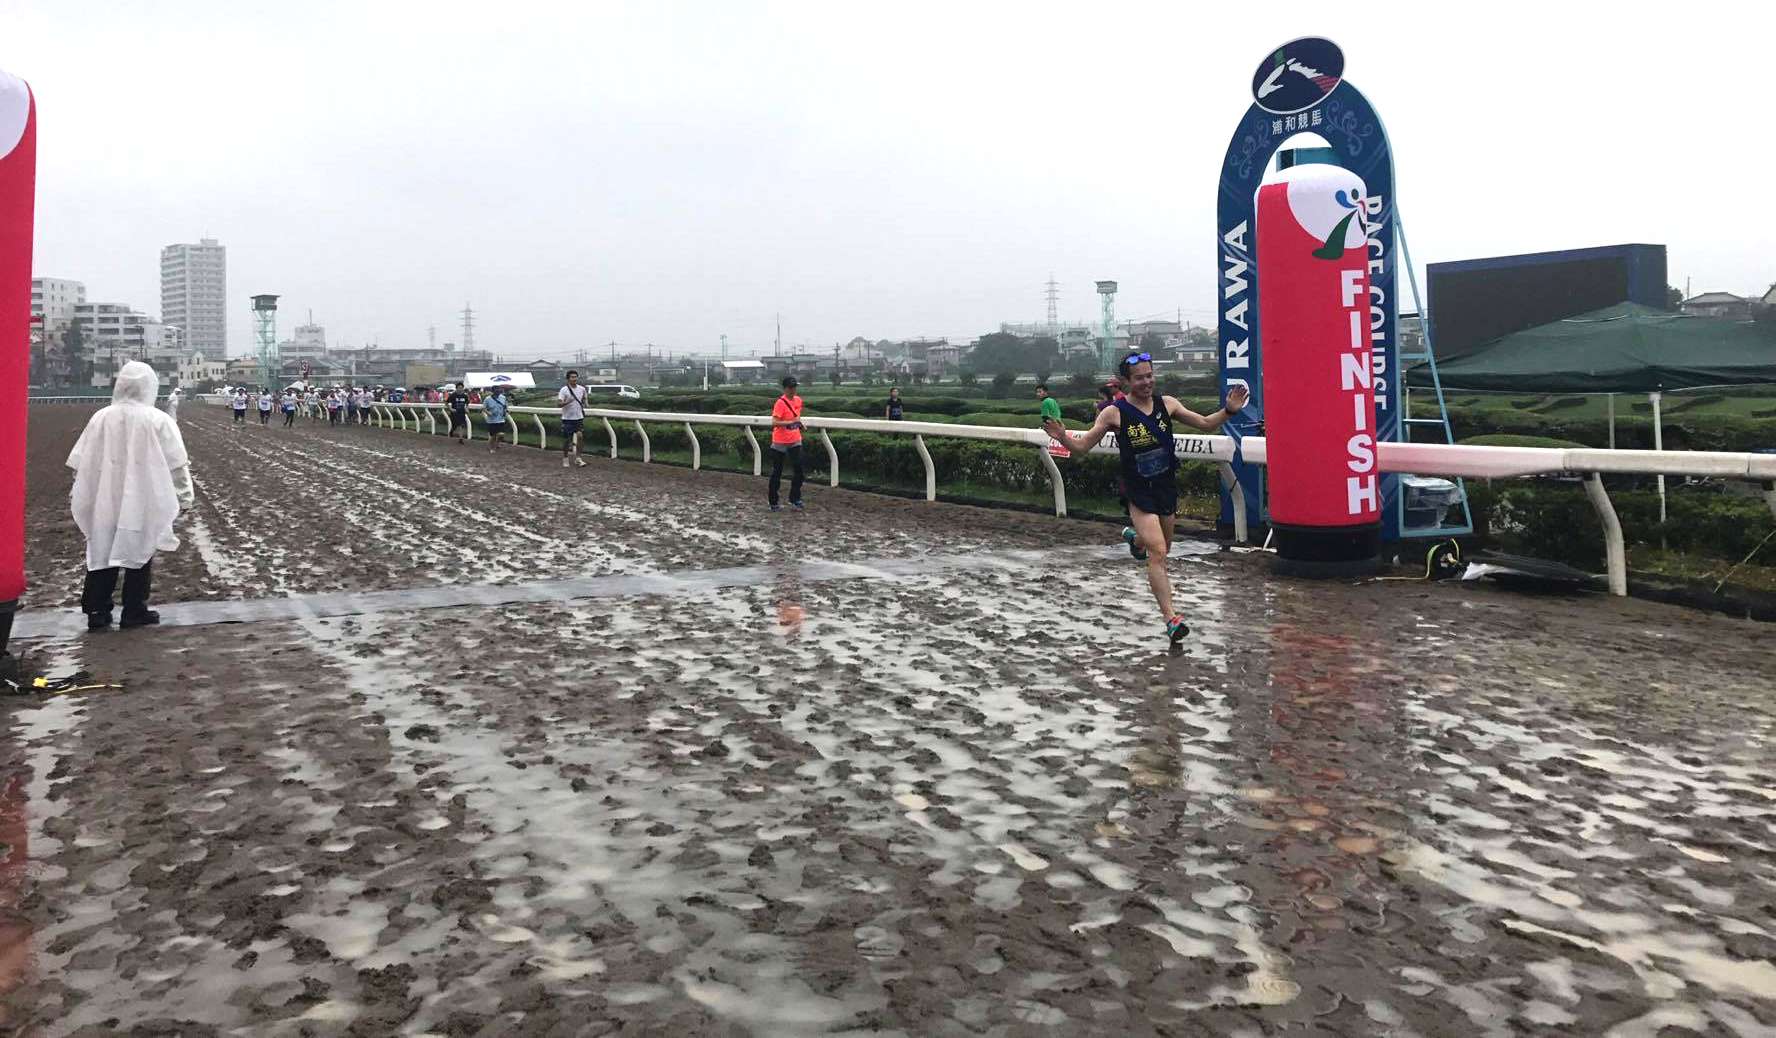 Inaugral Urawa Horse Racecourse Relay Marathon / 第1回浦和競馬場リレーマラソン, 24th September 2016